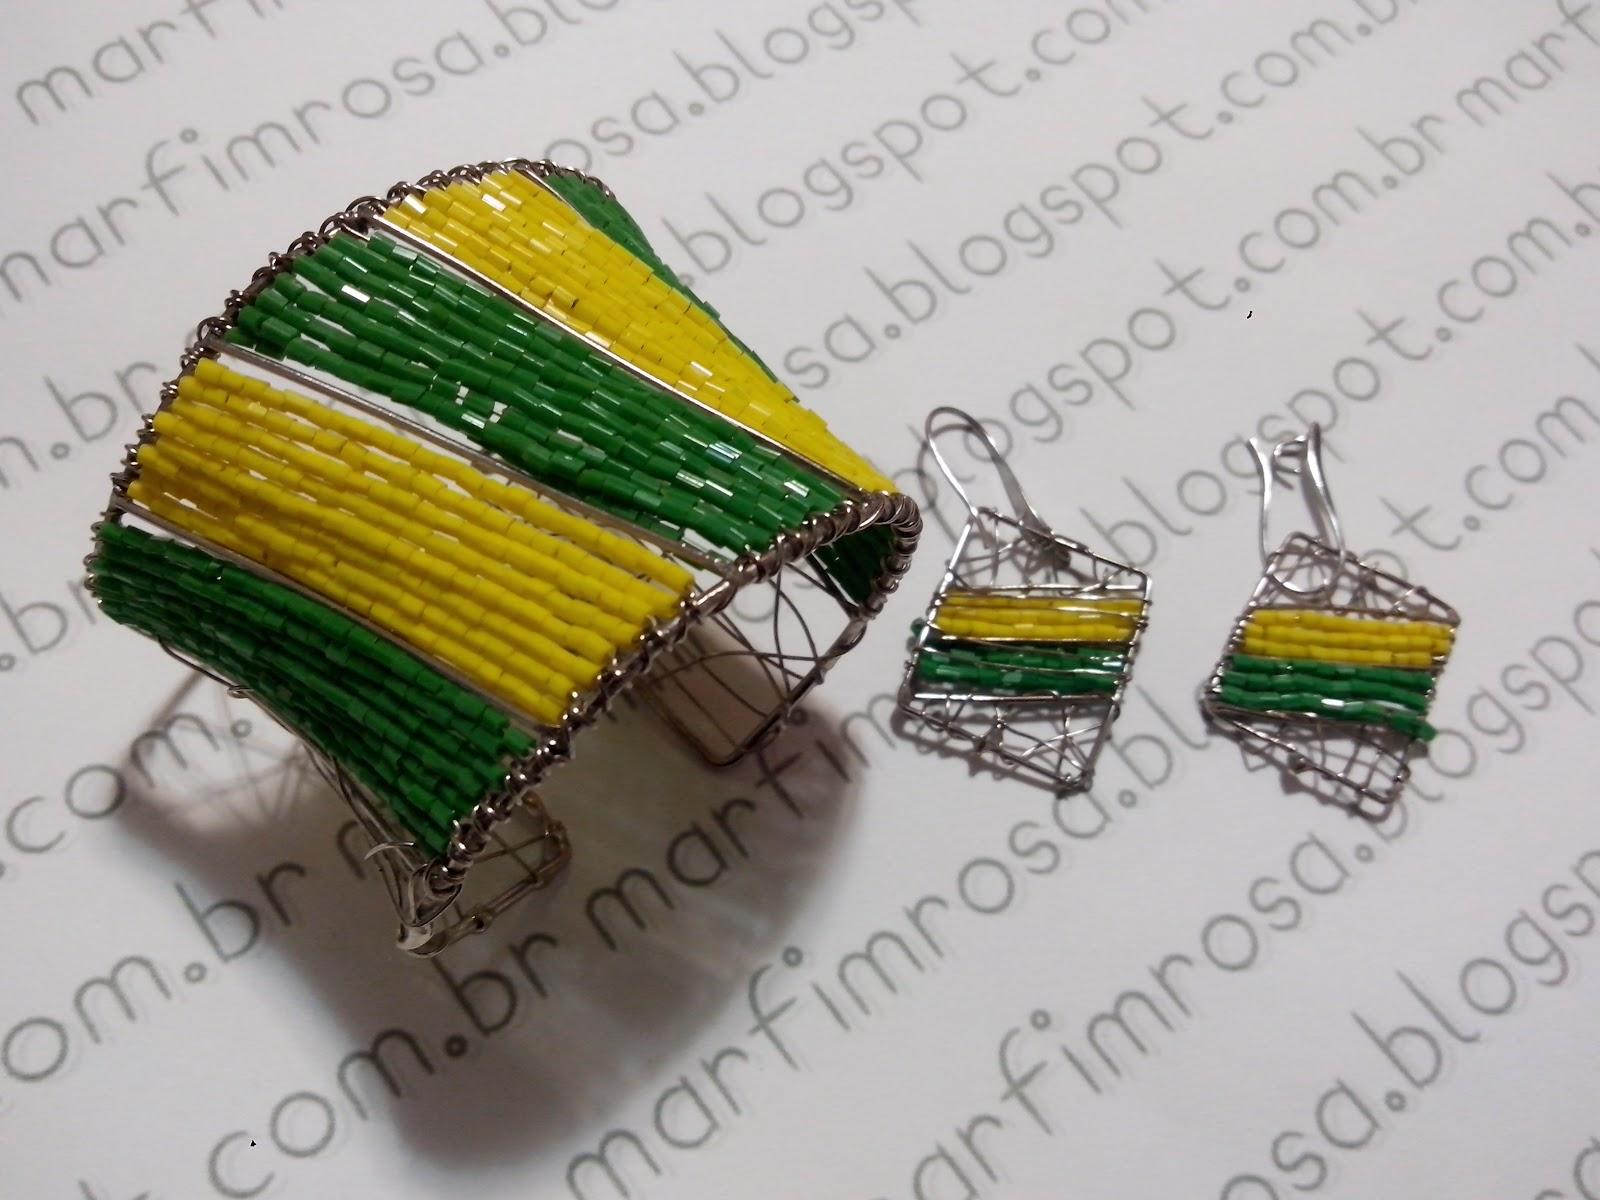 Acessórios para Copa do Mundo 2014 Brasil